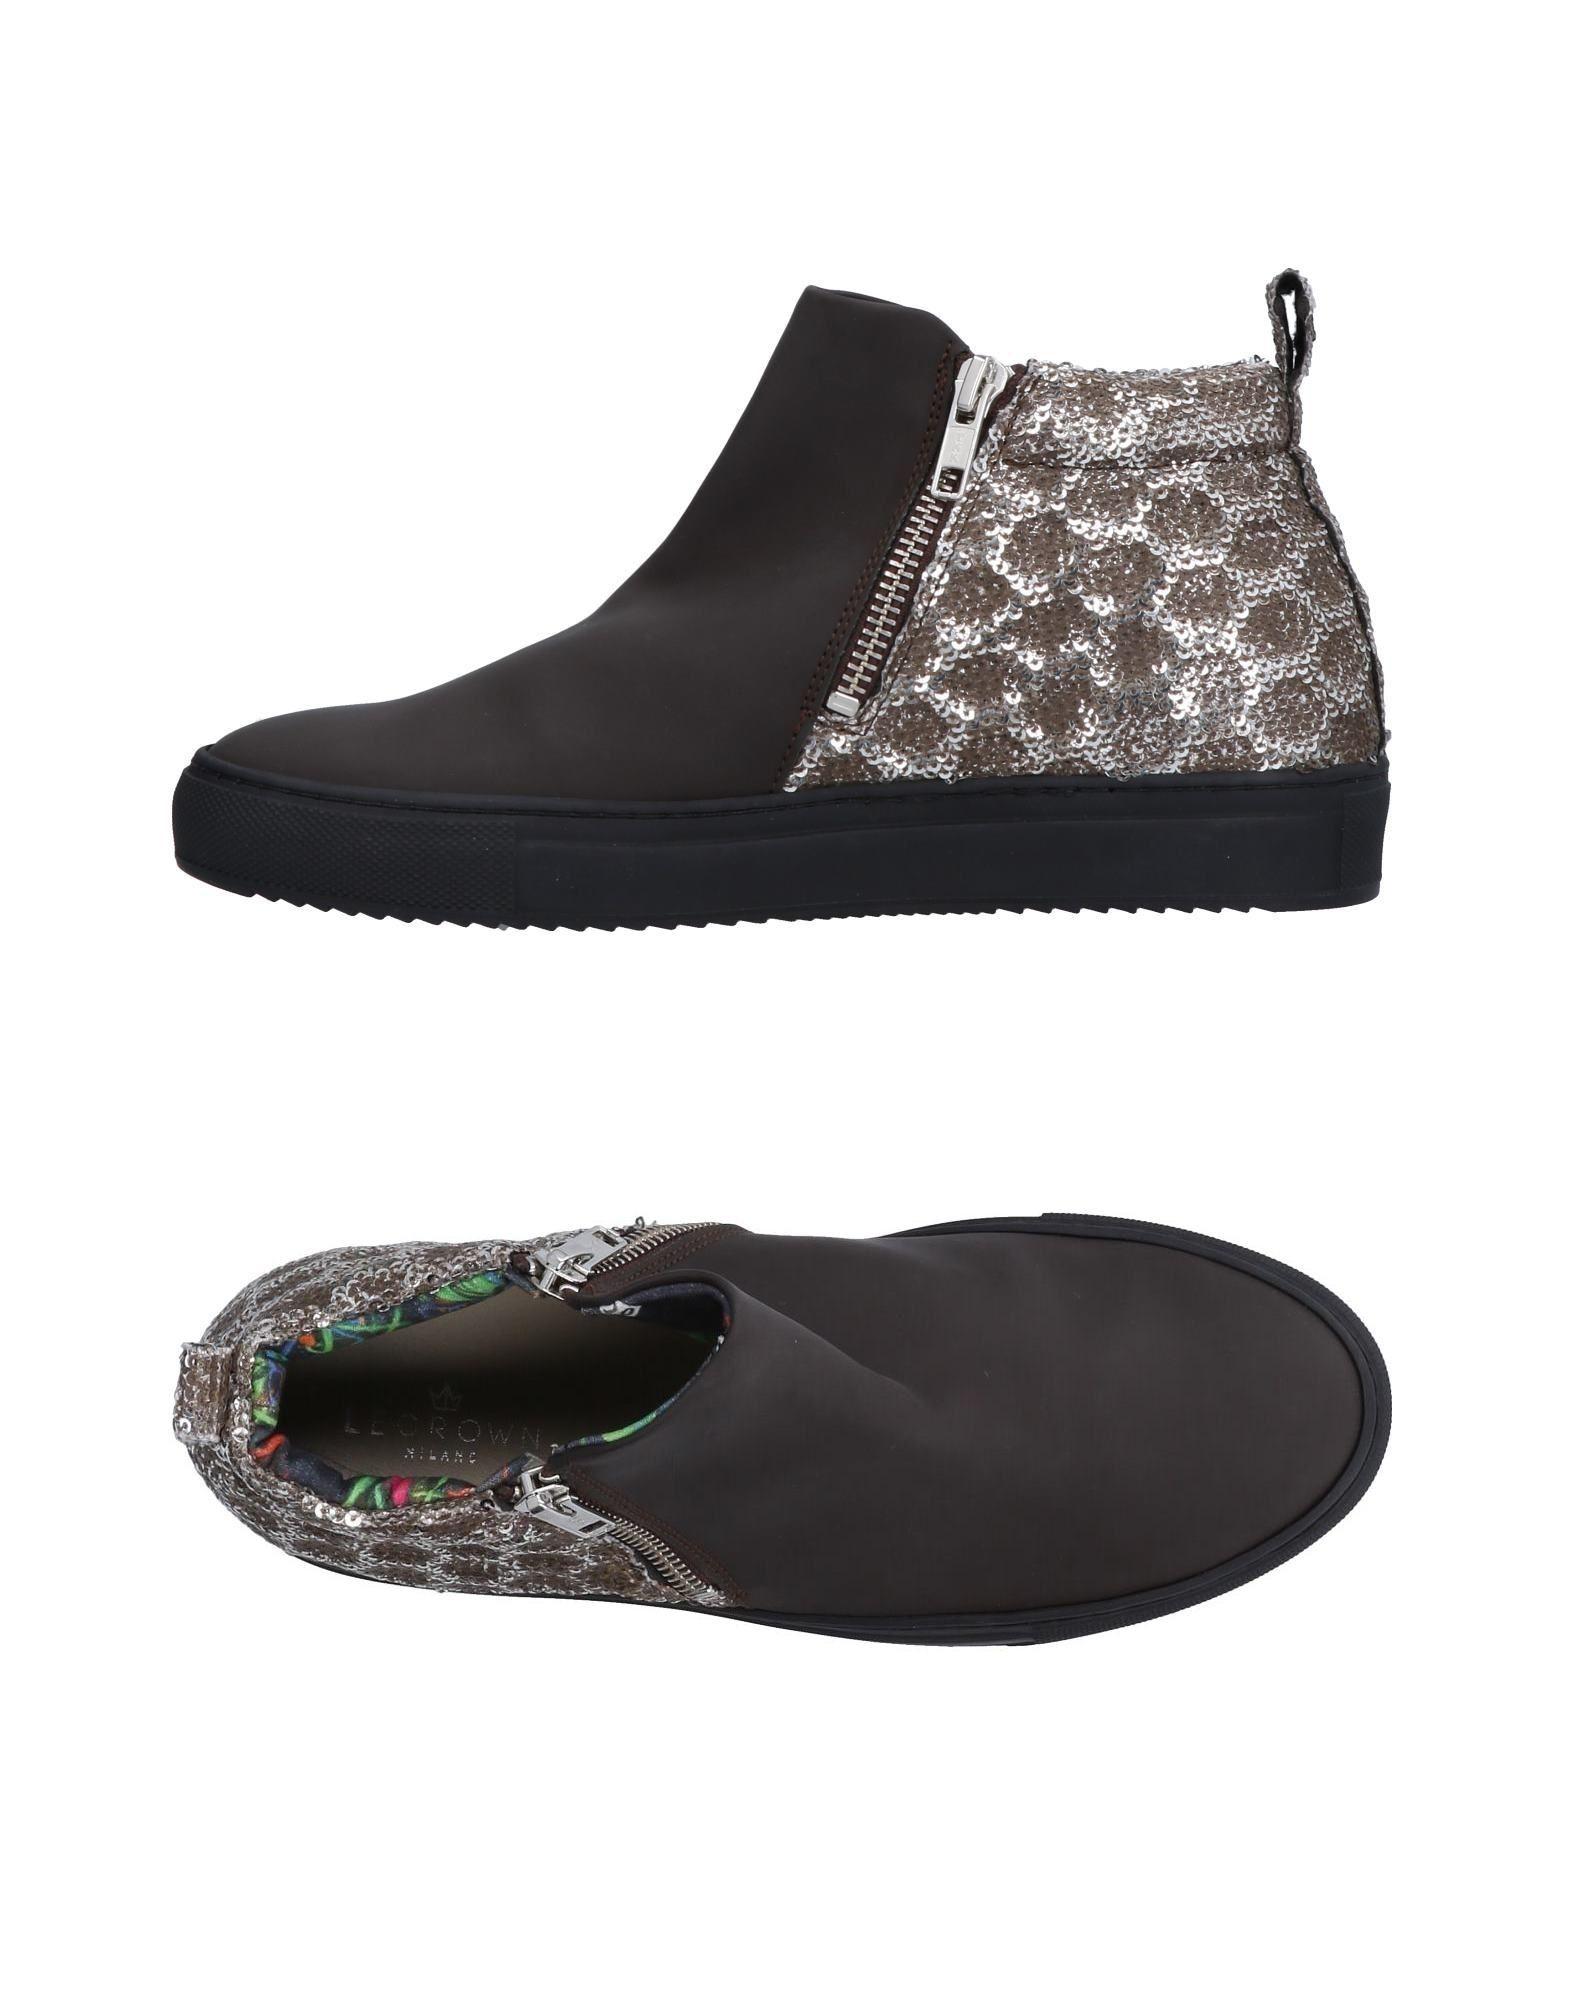 LE CROWN Высокие кеды и кроссовки кеды кроссовки высокие женские dc evan hi le brown dark chocolate